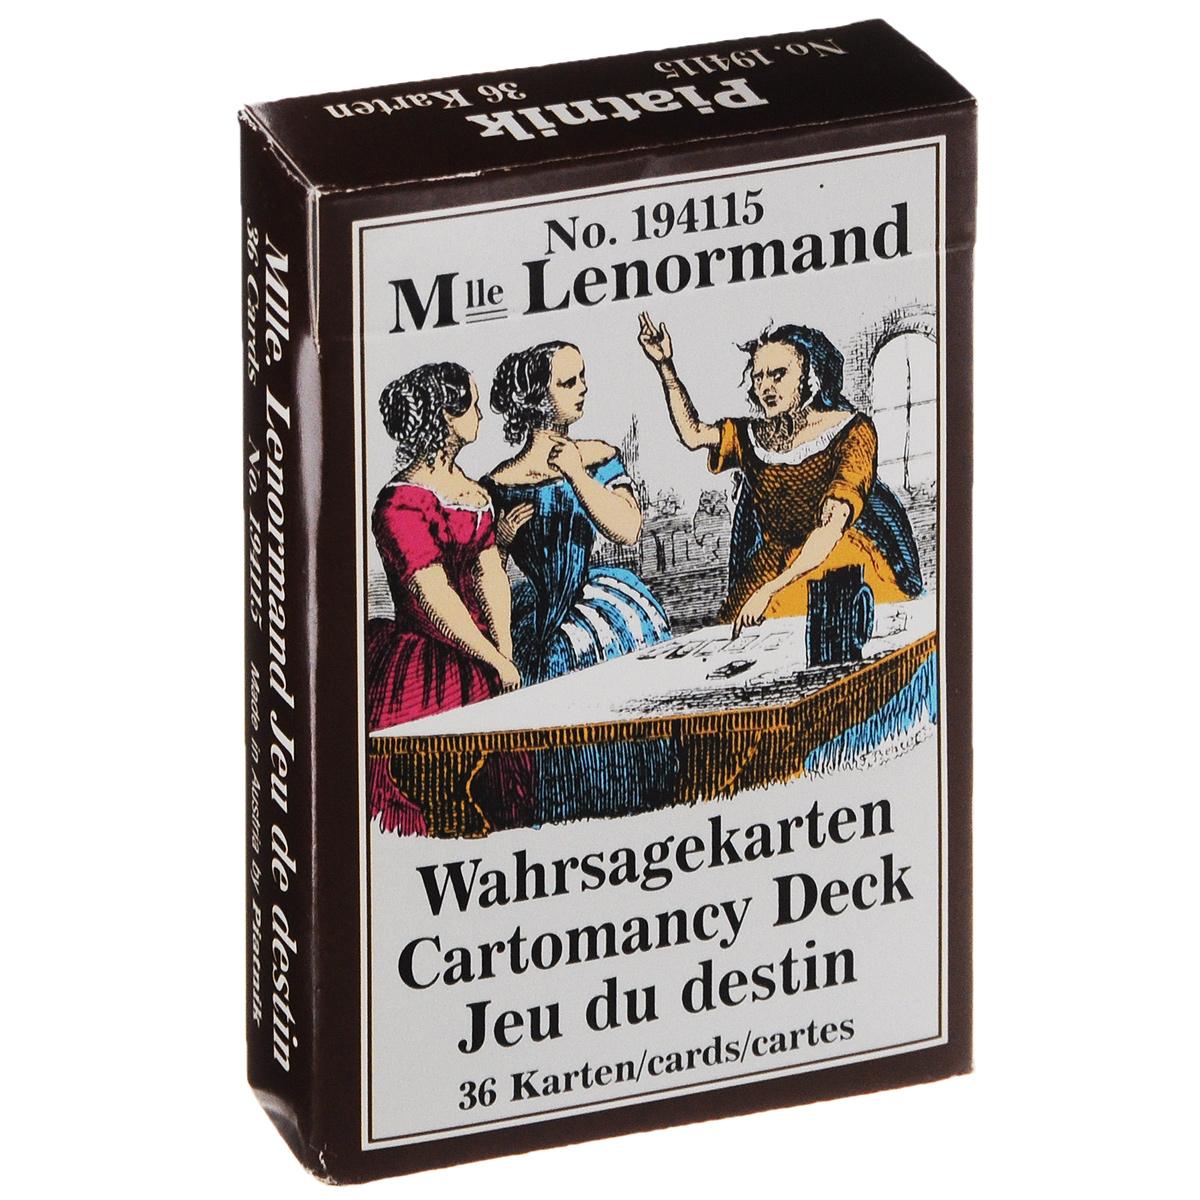 цена на M-lle Lenormand: Wahrsagekarten Cartomancy Deck: Jeu du destin